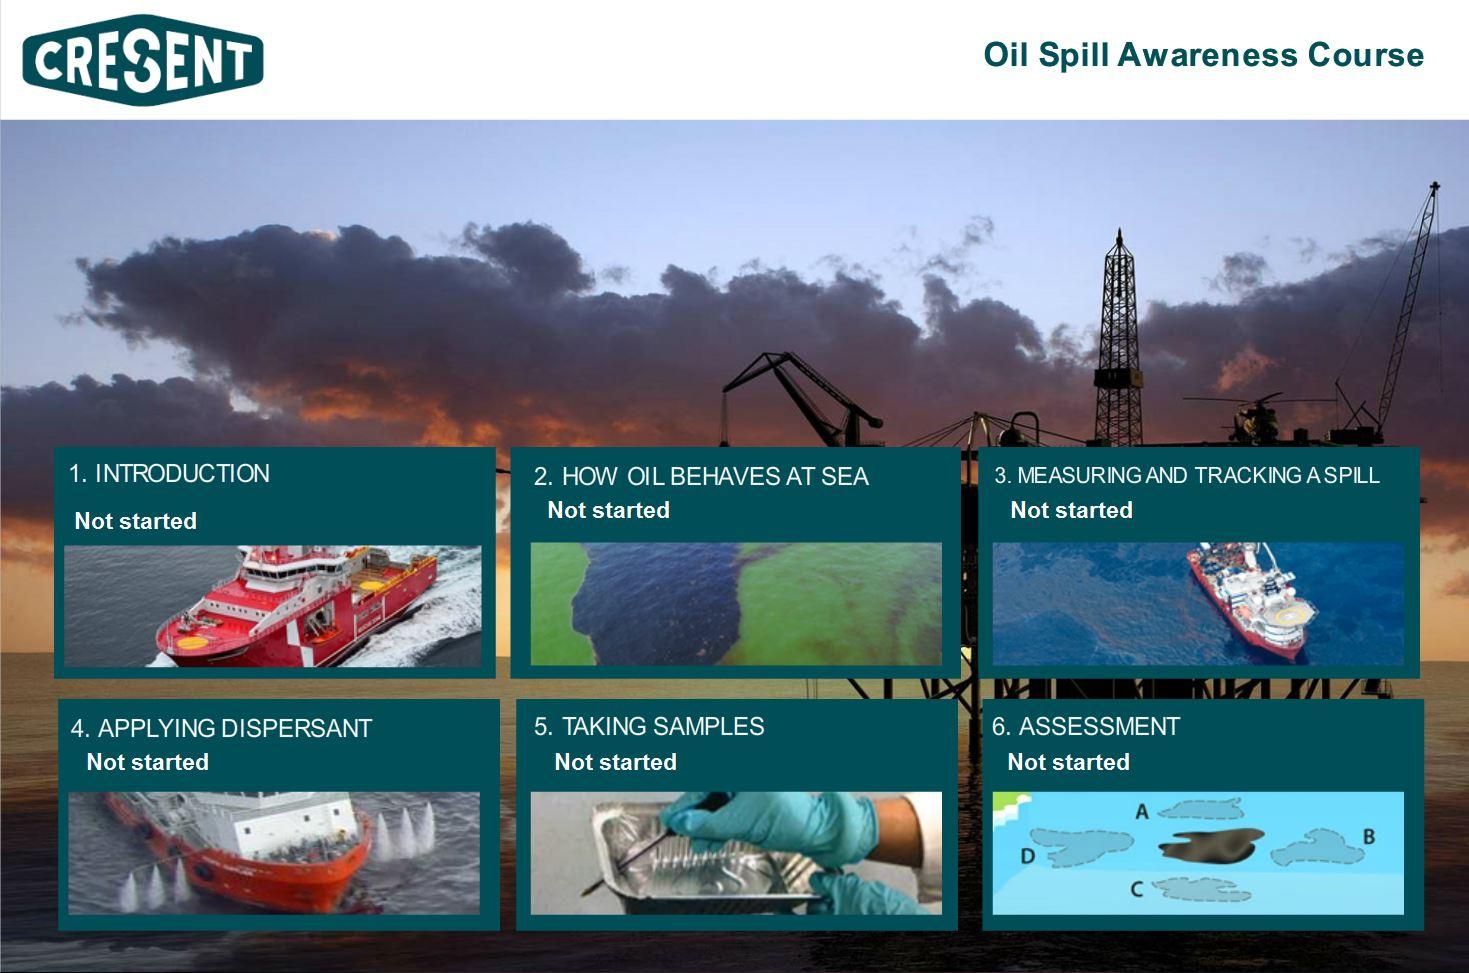 Oil Spill Awareness for Vessel Crews